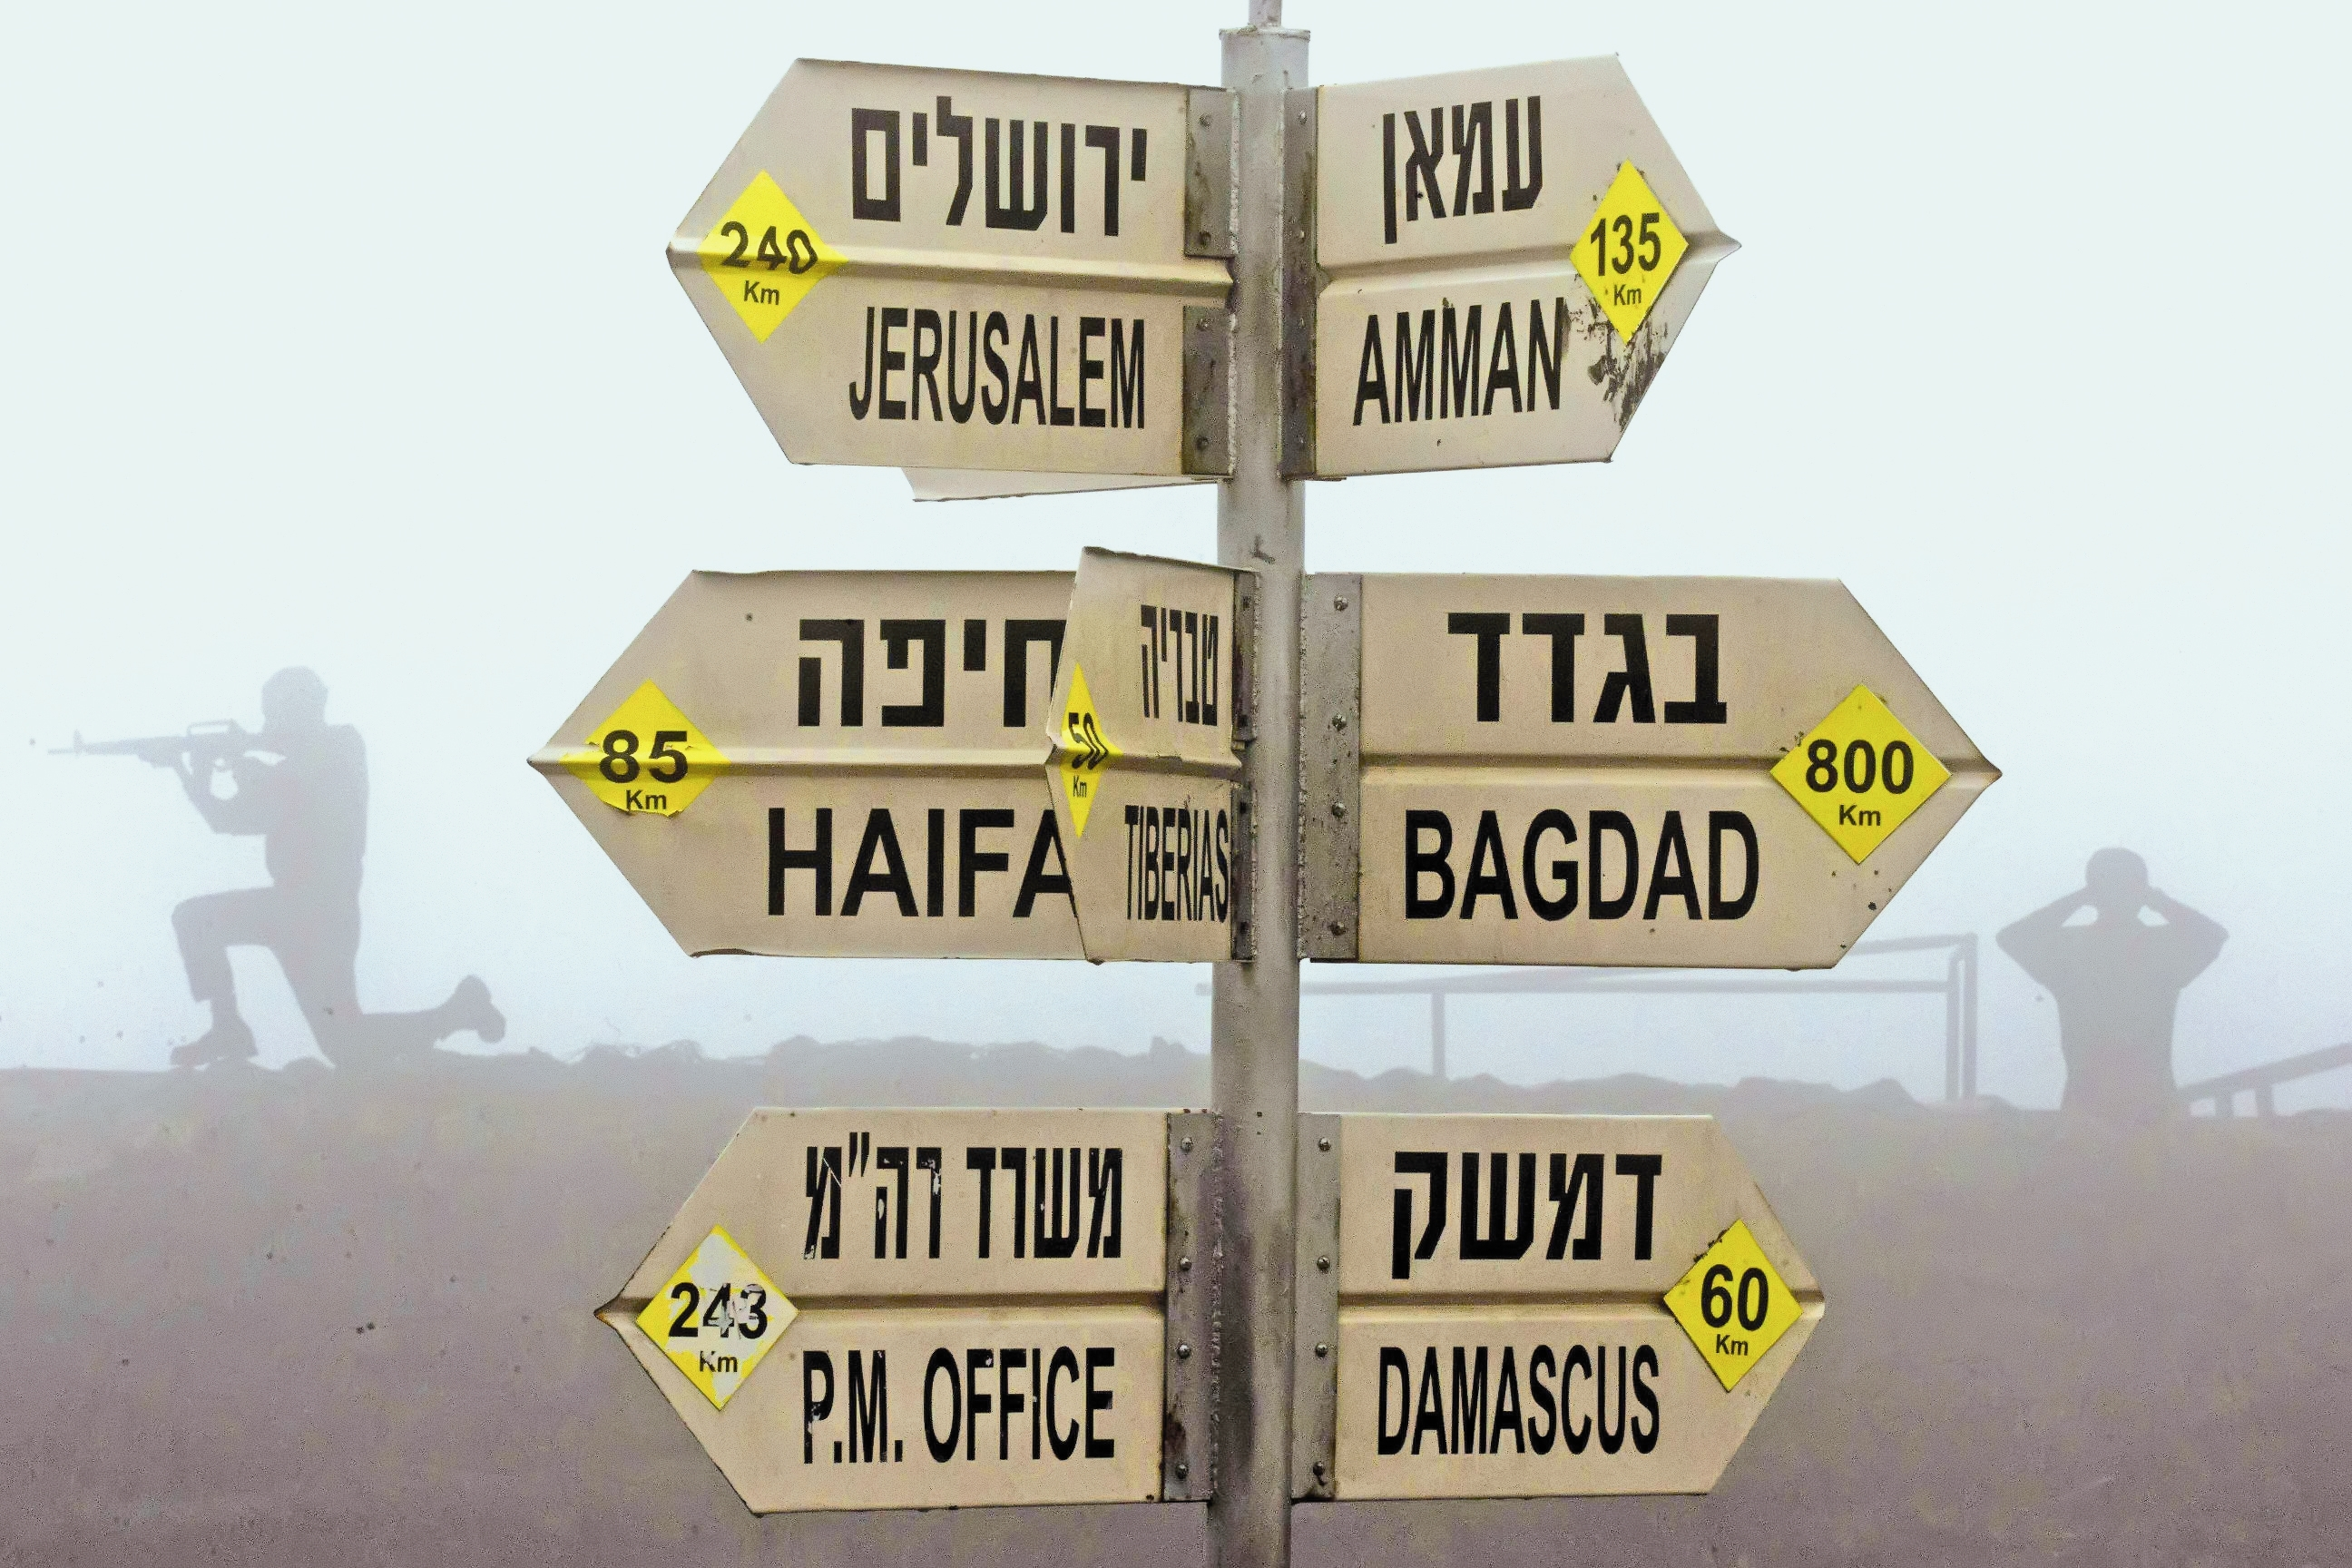 تابلو -اسرائیل